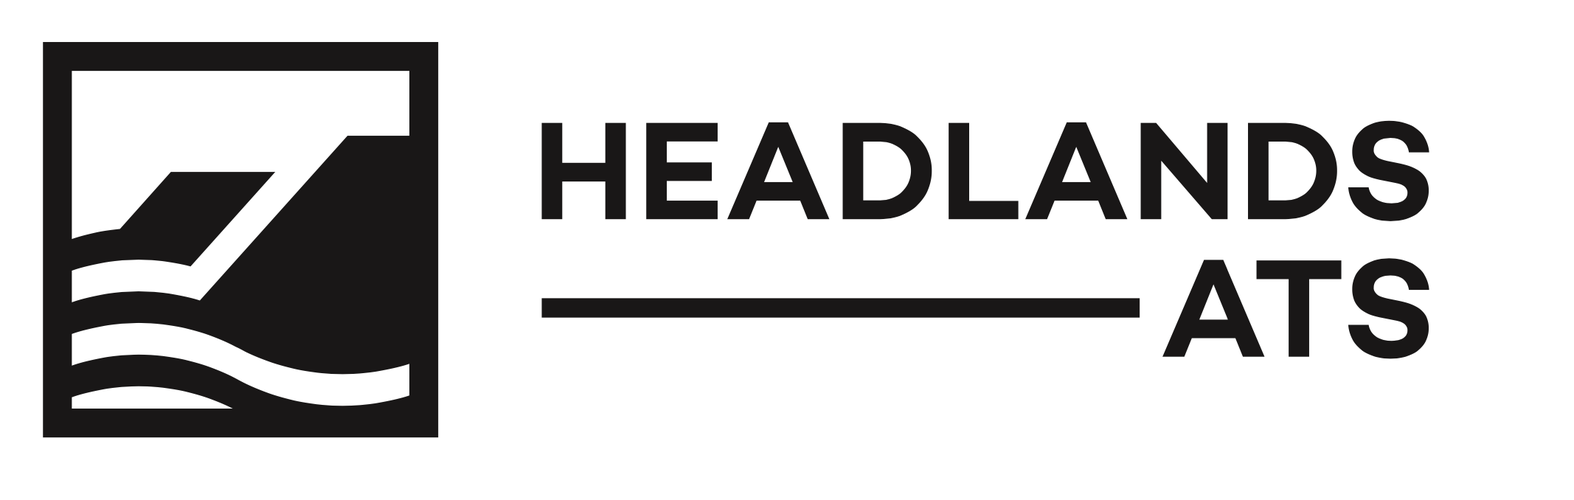 Headlands Addiction Treatment Services